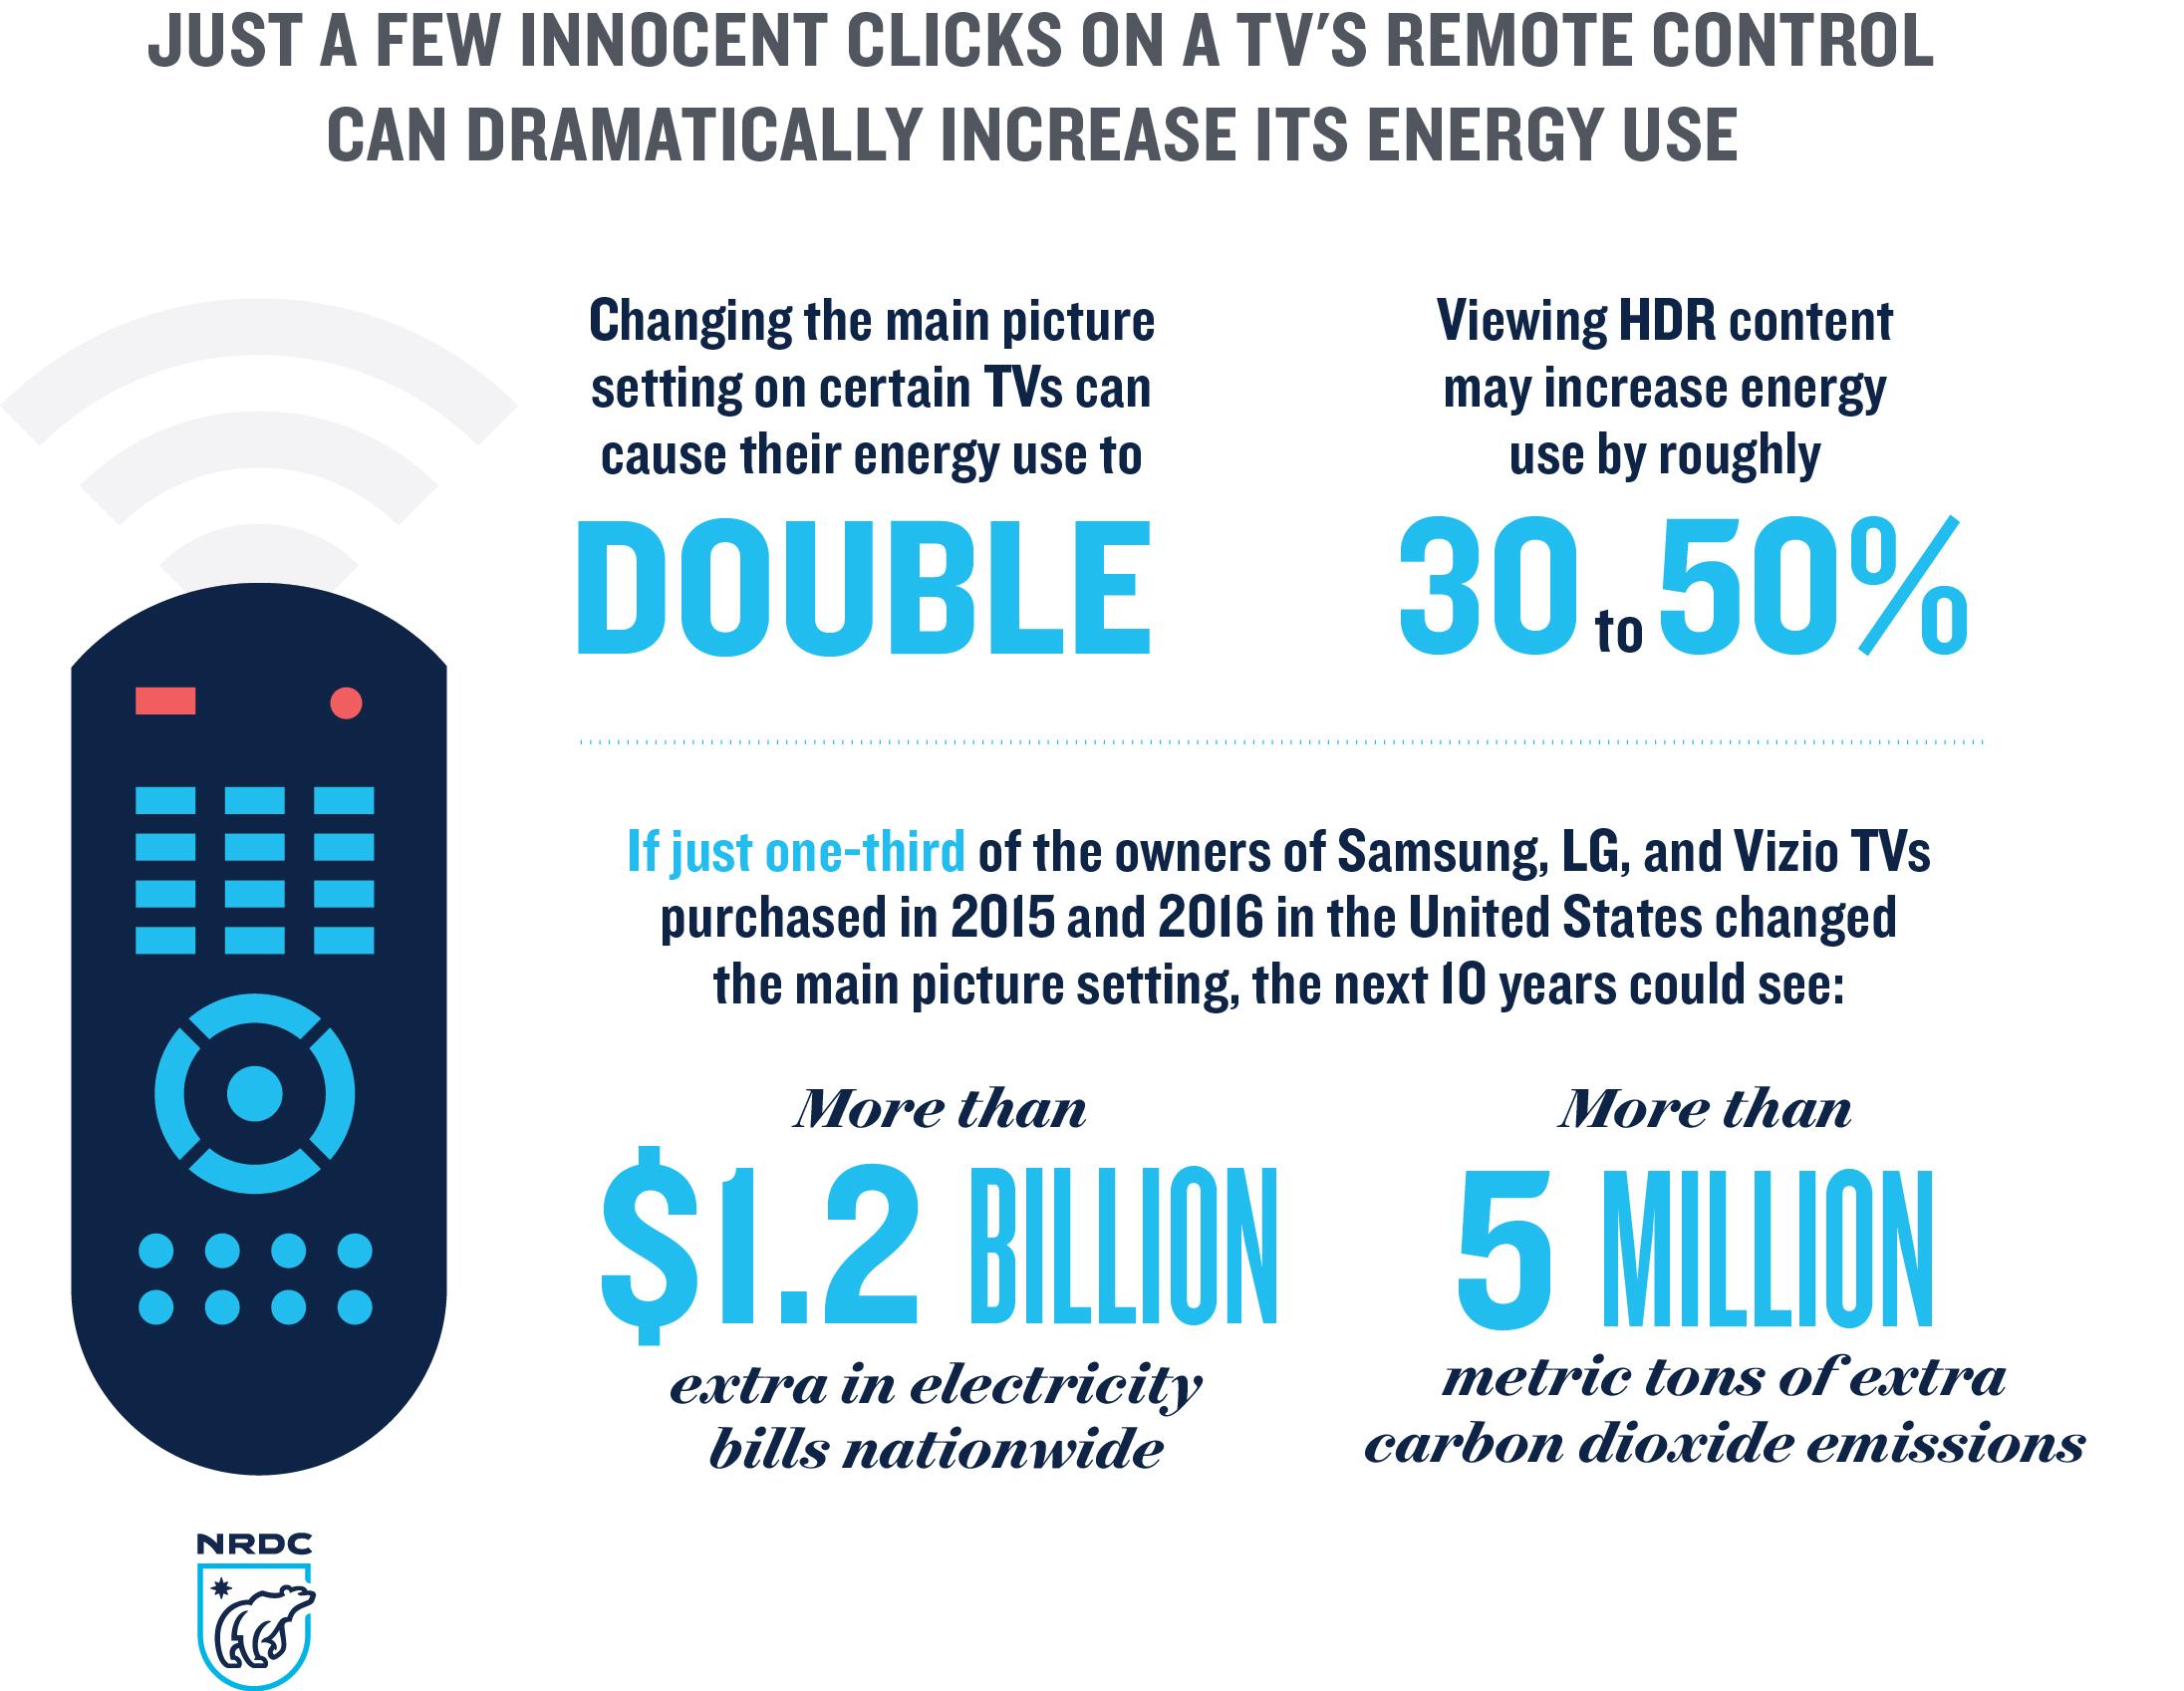 8 Universal Remotes Ideas Remotes Infographic Social Tv